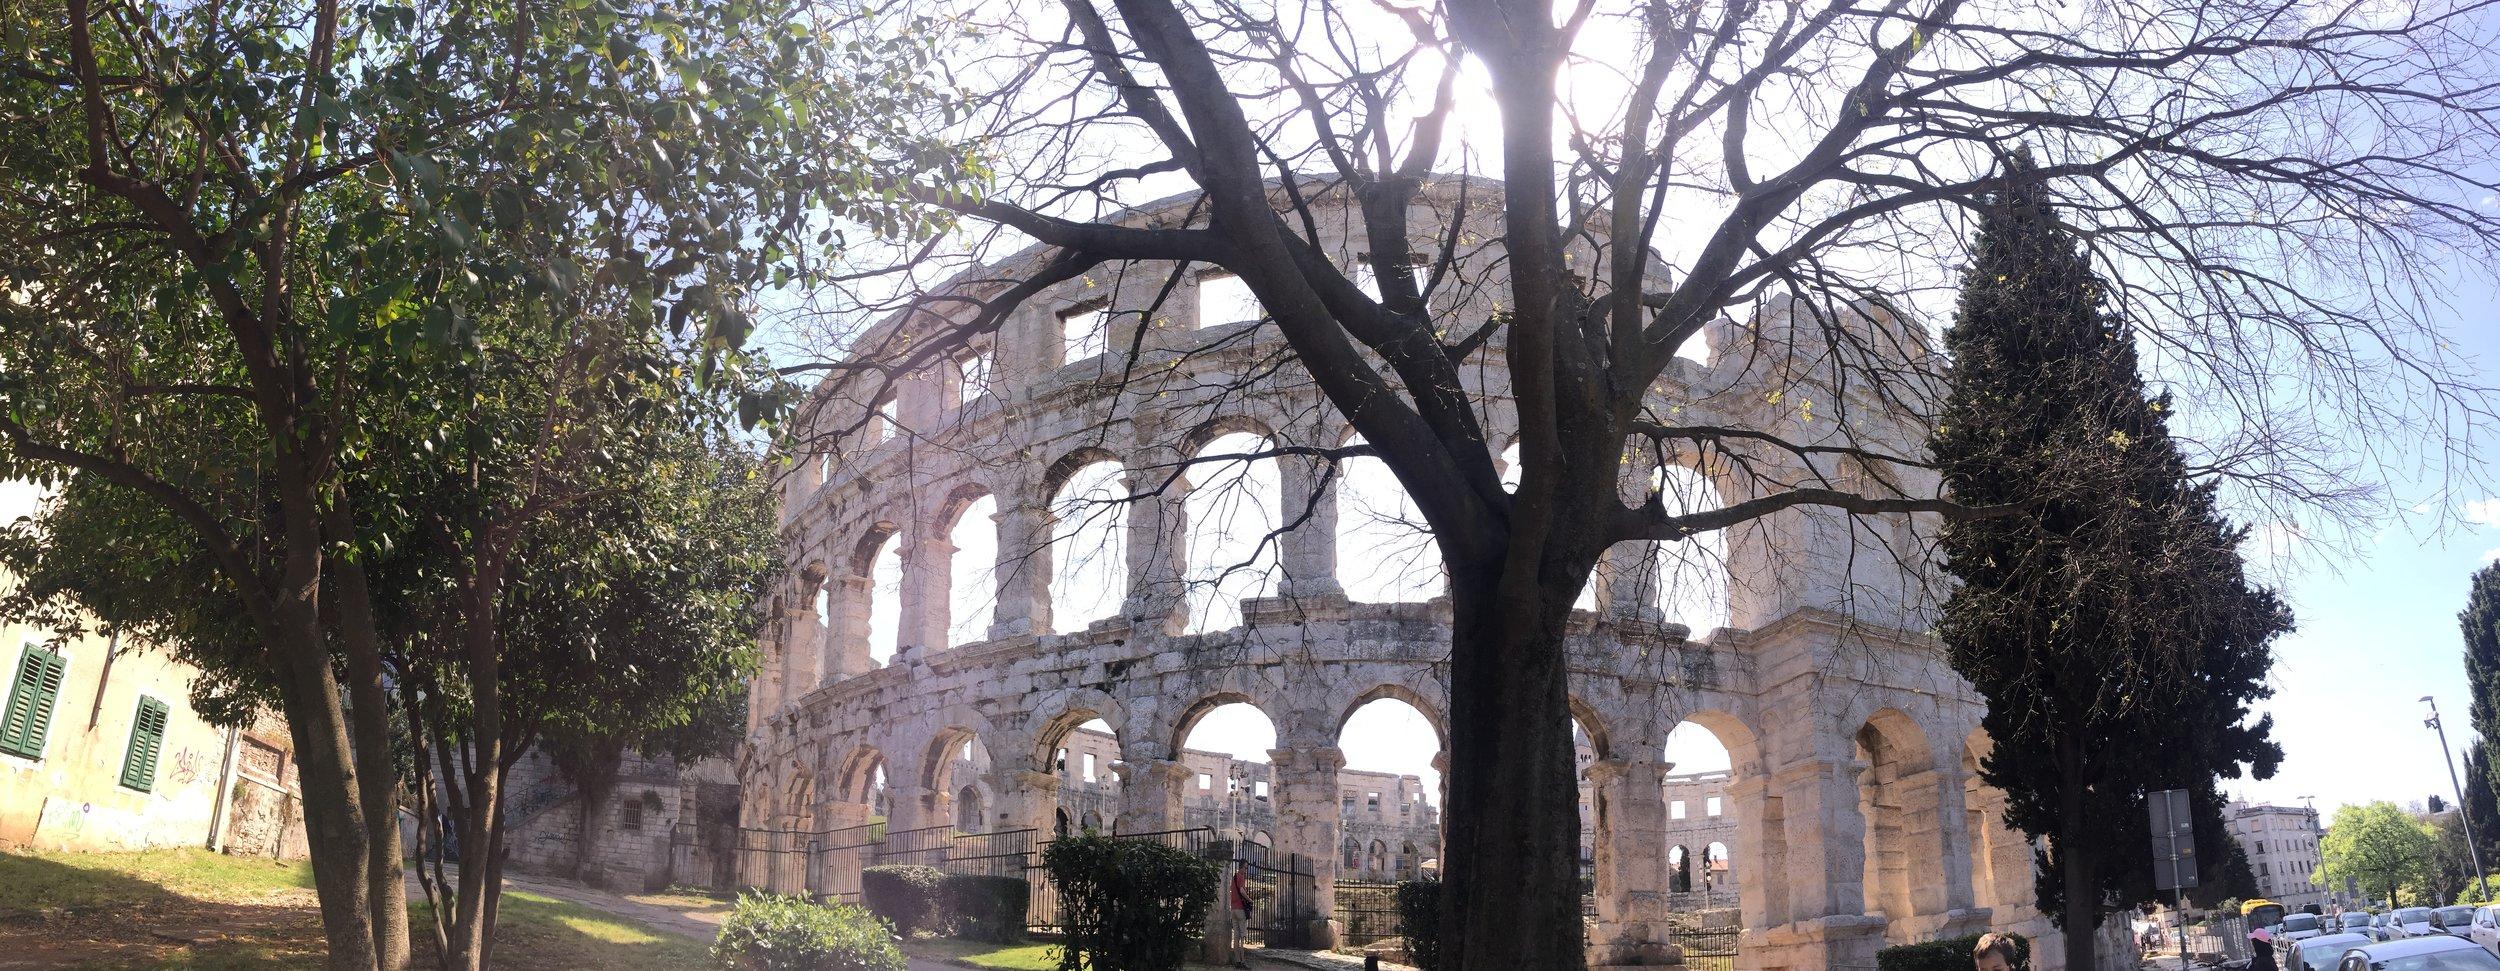 Roman amphitheatre, built 27 BC - 68 AD